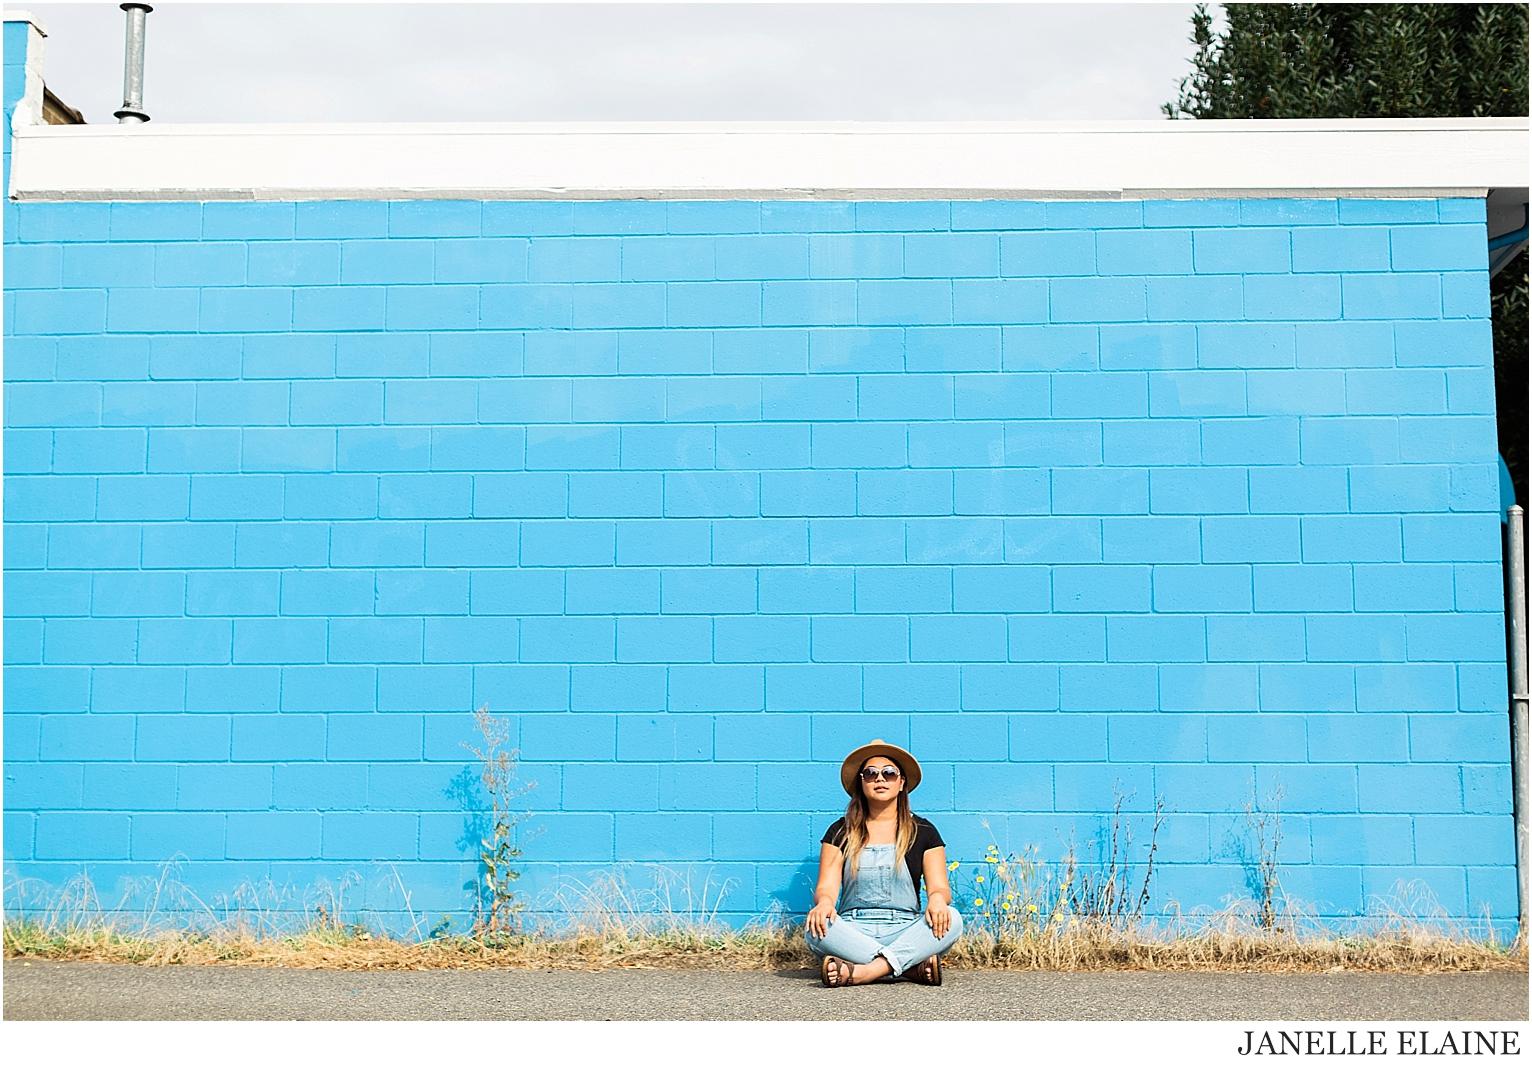 Aiko-Seattle WA-lifestyle photoshoot-Renton-Janelle Elaine Photography-6.jpg